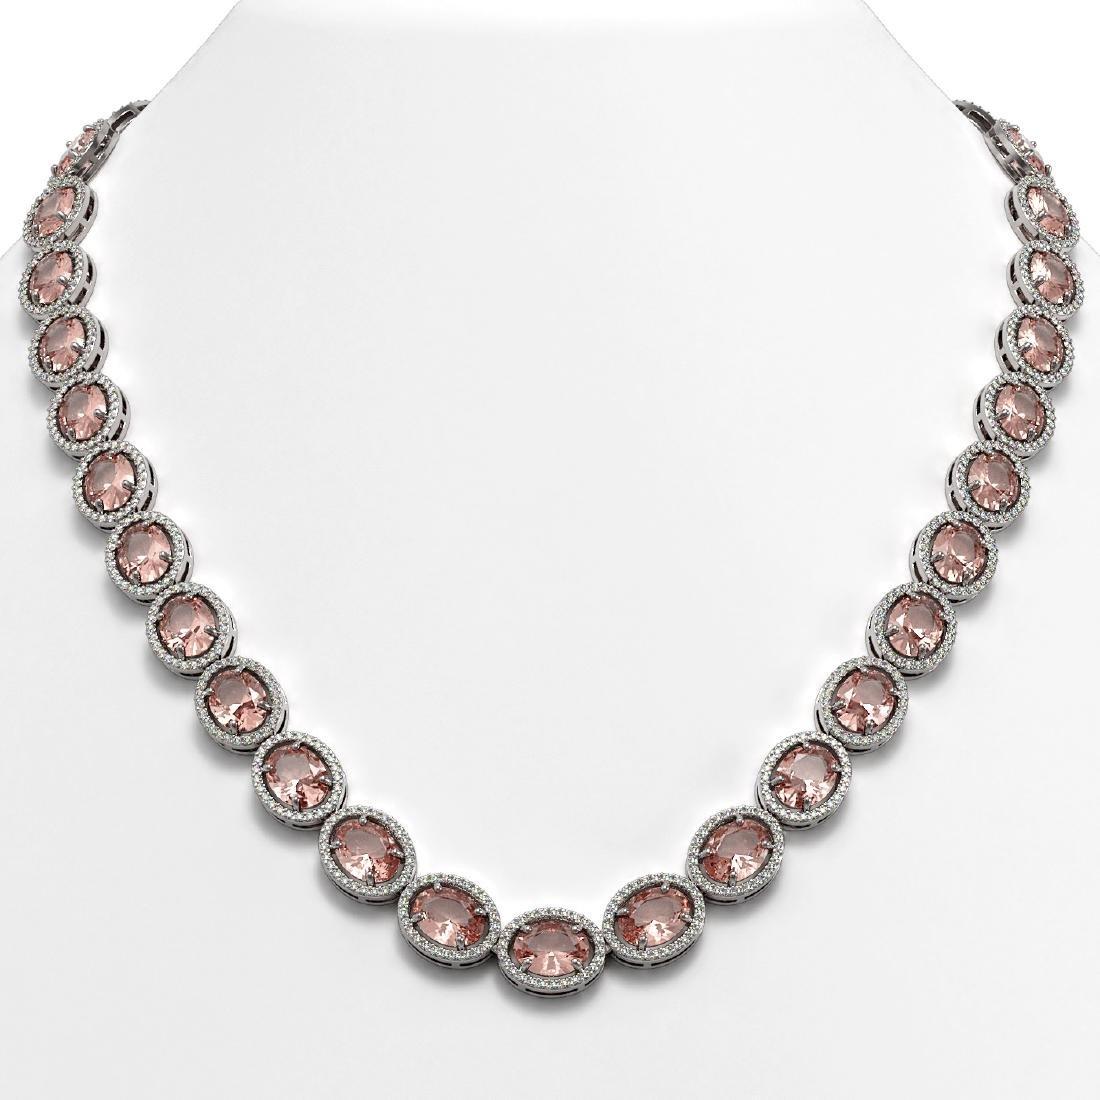 52.63 CTW Morganite & Diamond Halo Necklace 10K White